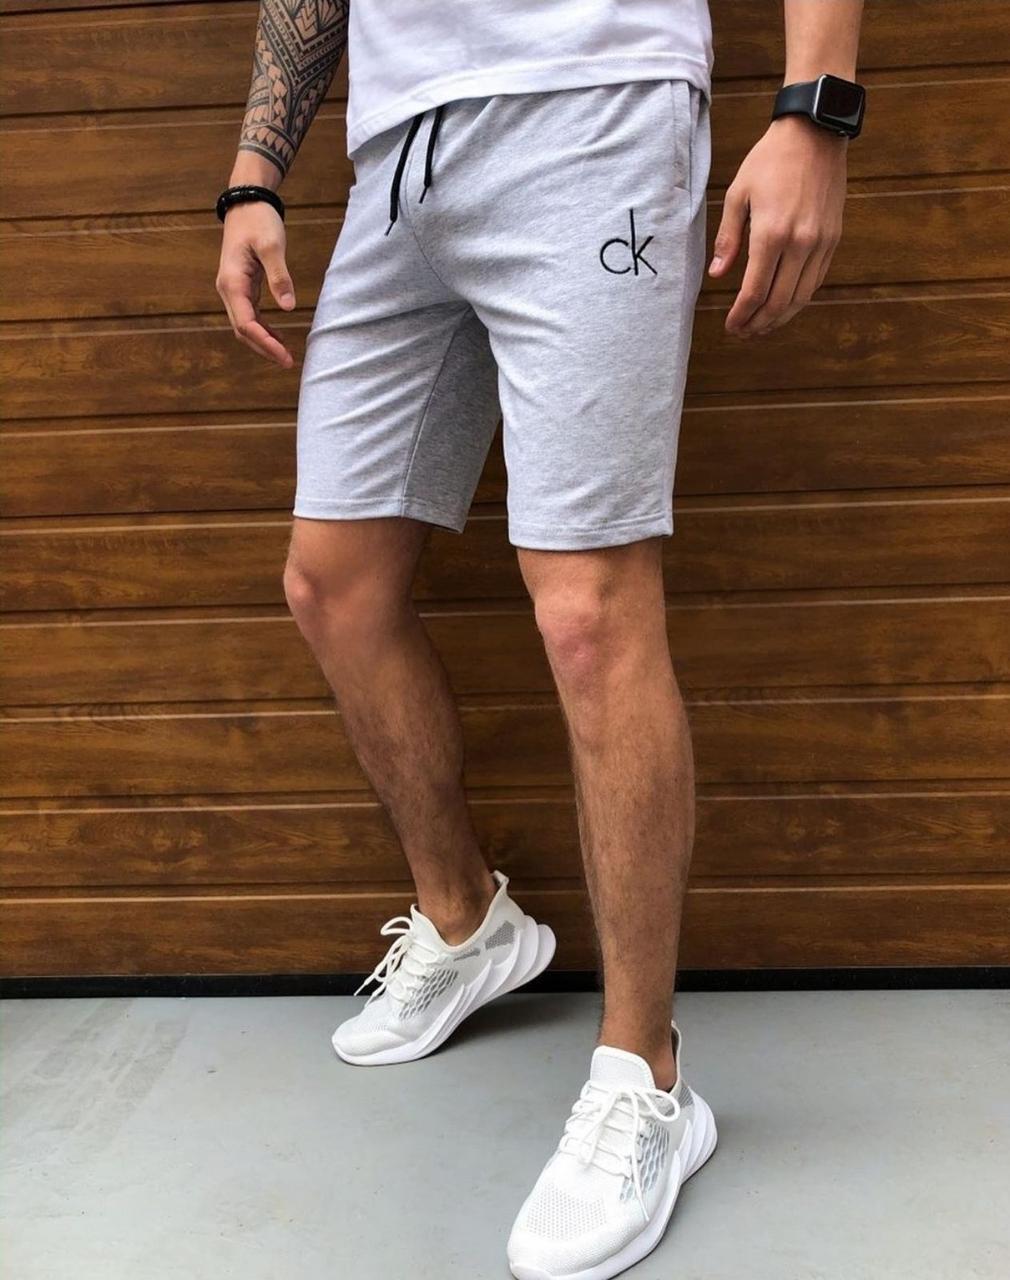 Шорты Calvin Klein мужские весна однотон двунитка  пенье S M L XL XXL со склада